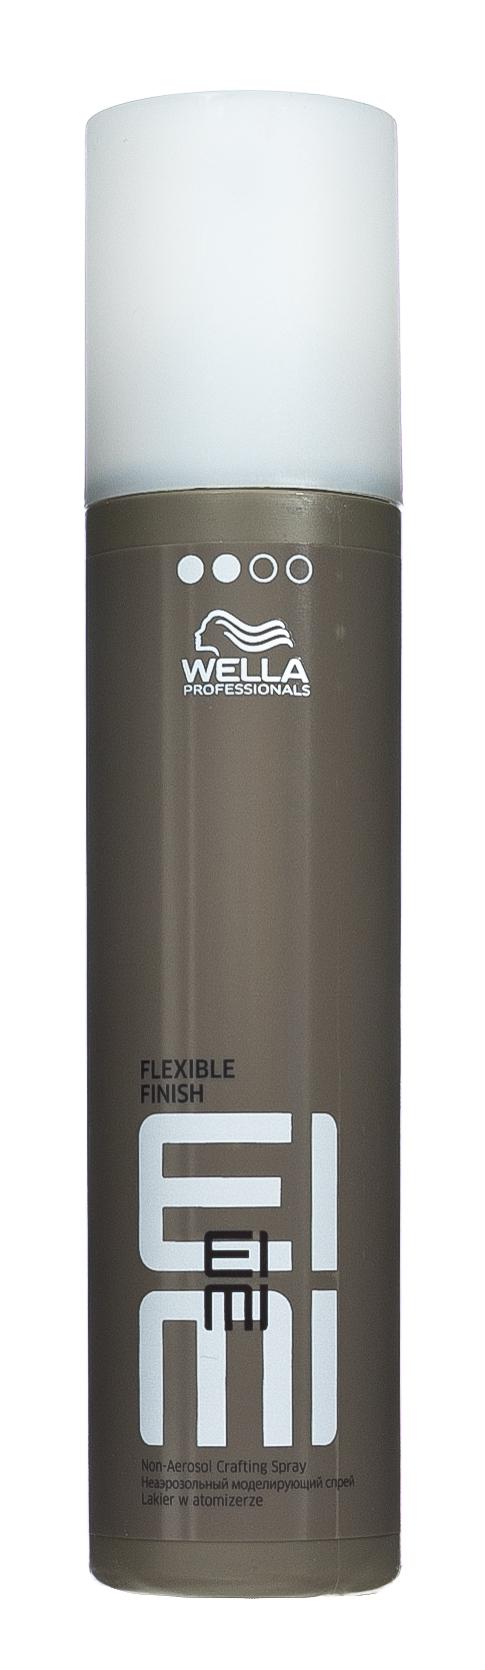 Wella Professional Неаэрозольный моделирующий спрей, 250 мл (Wella Professional, Eimi Фиксация)